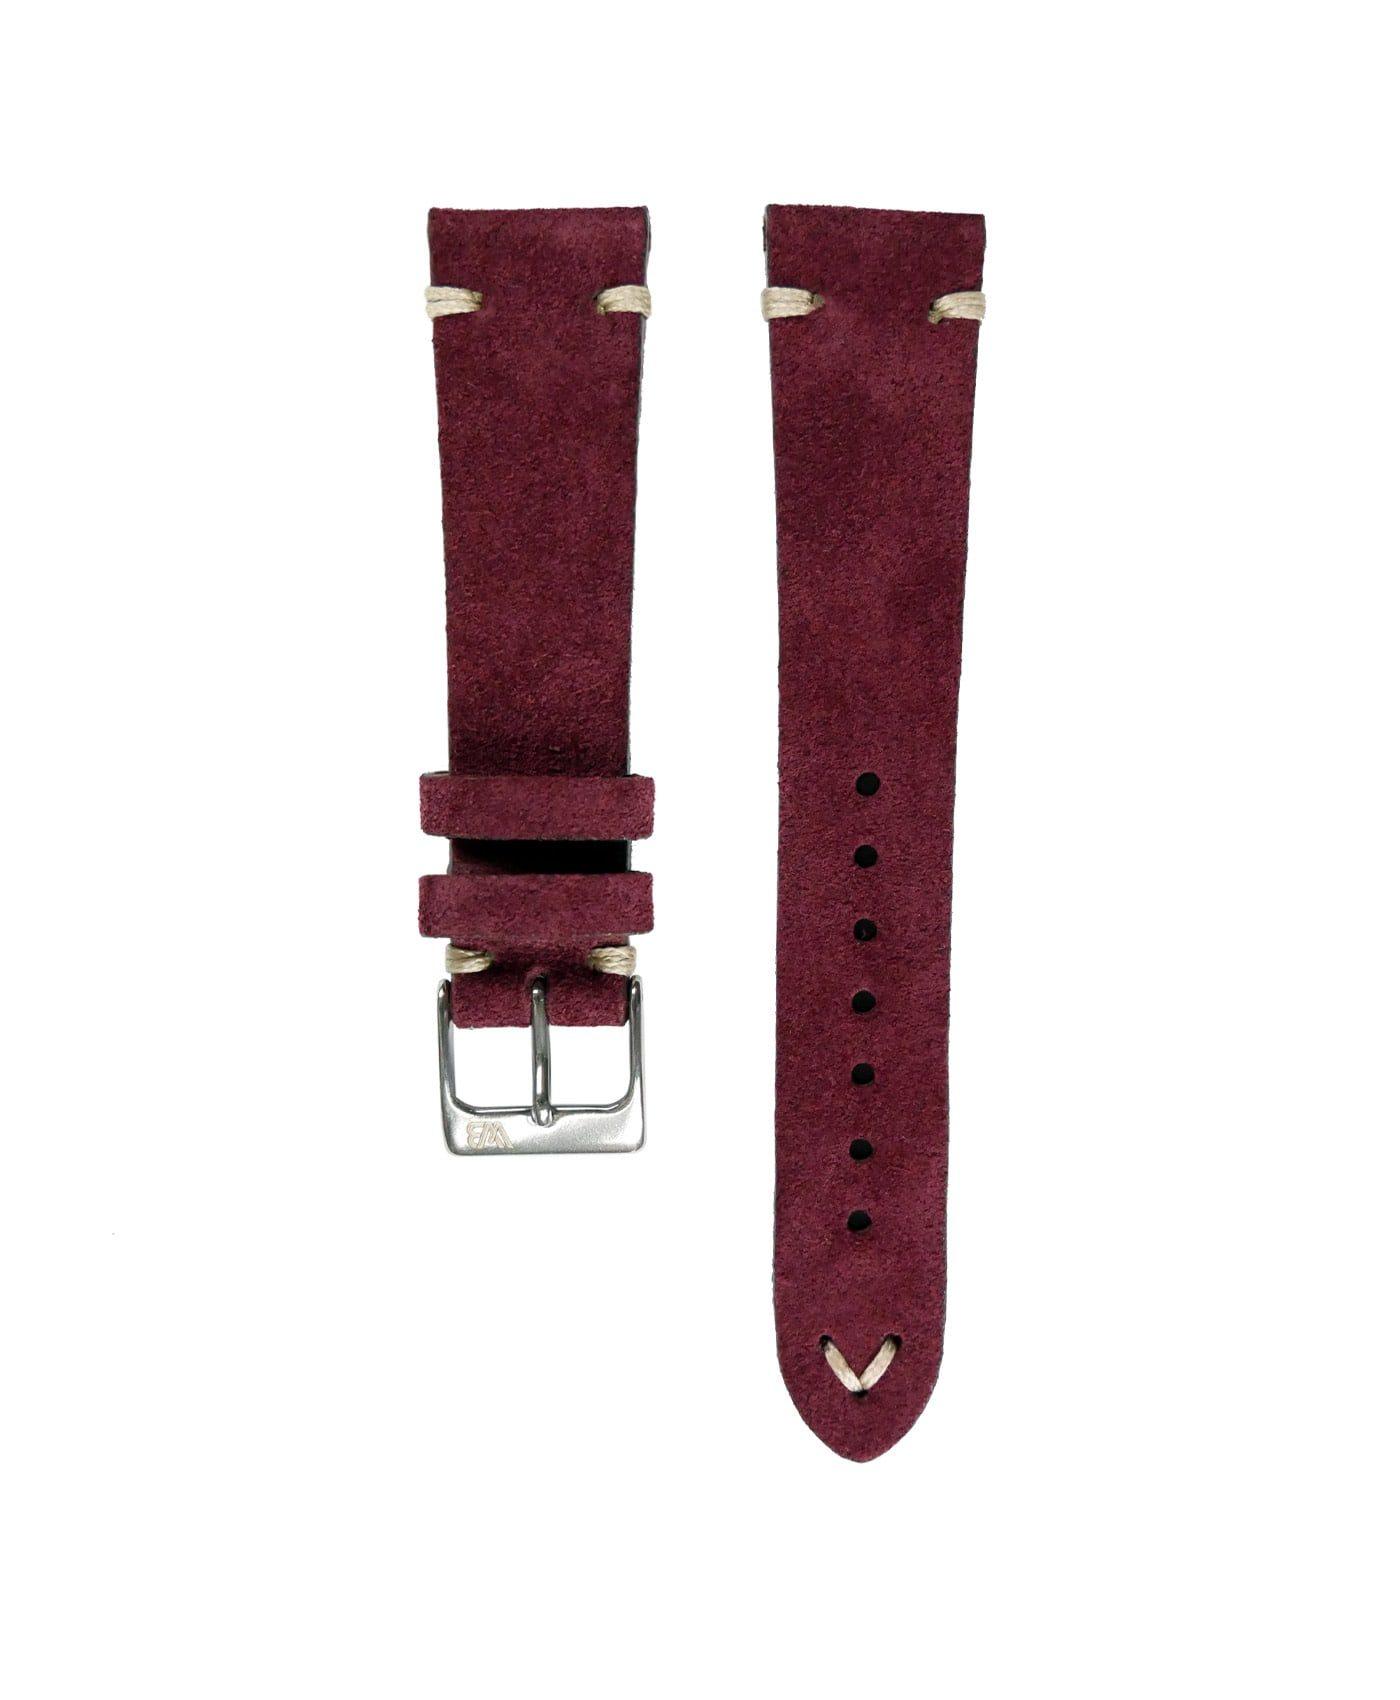 WB original premium suede watch strap burgundy bordeaux red front